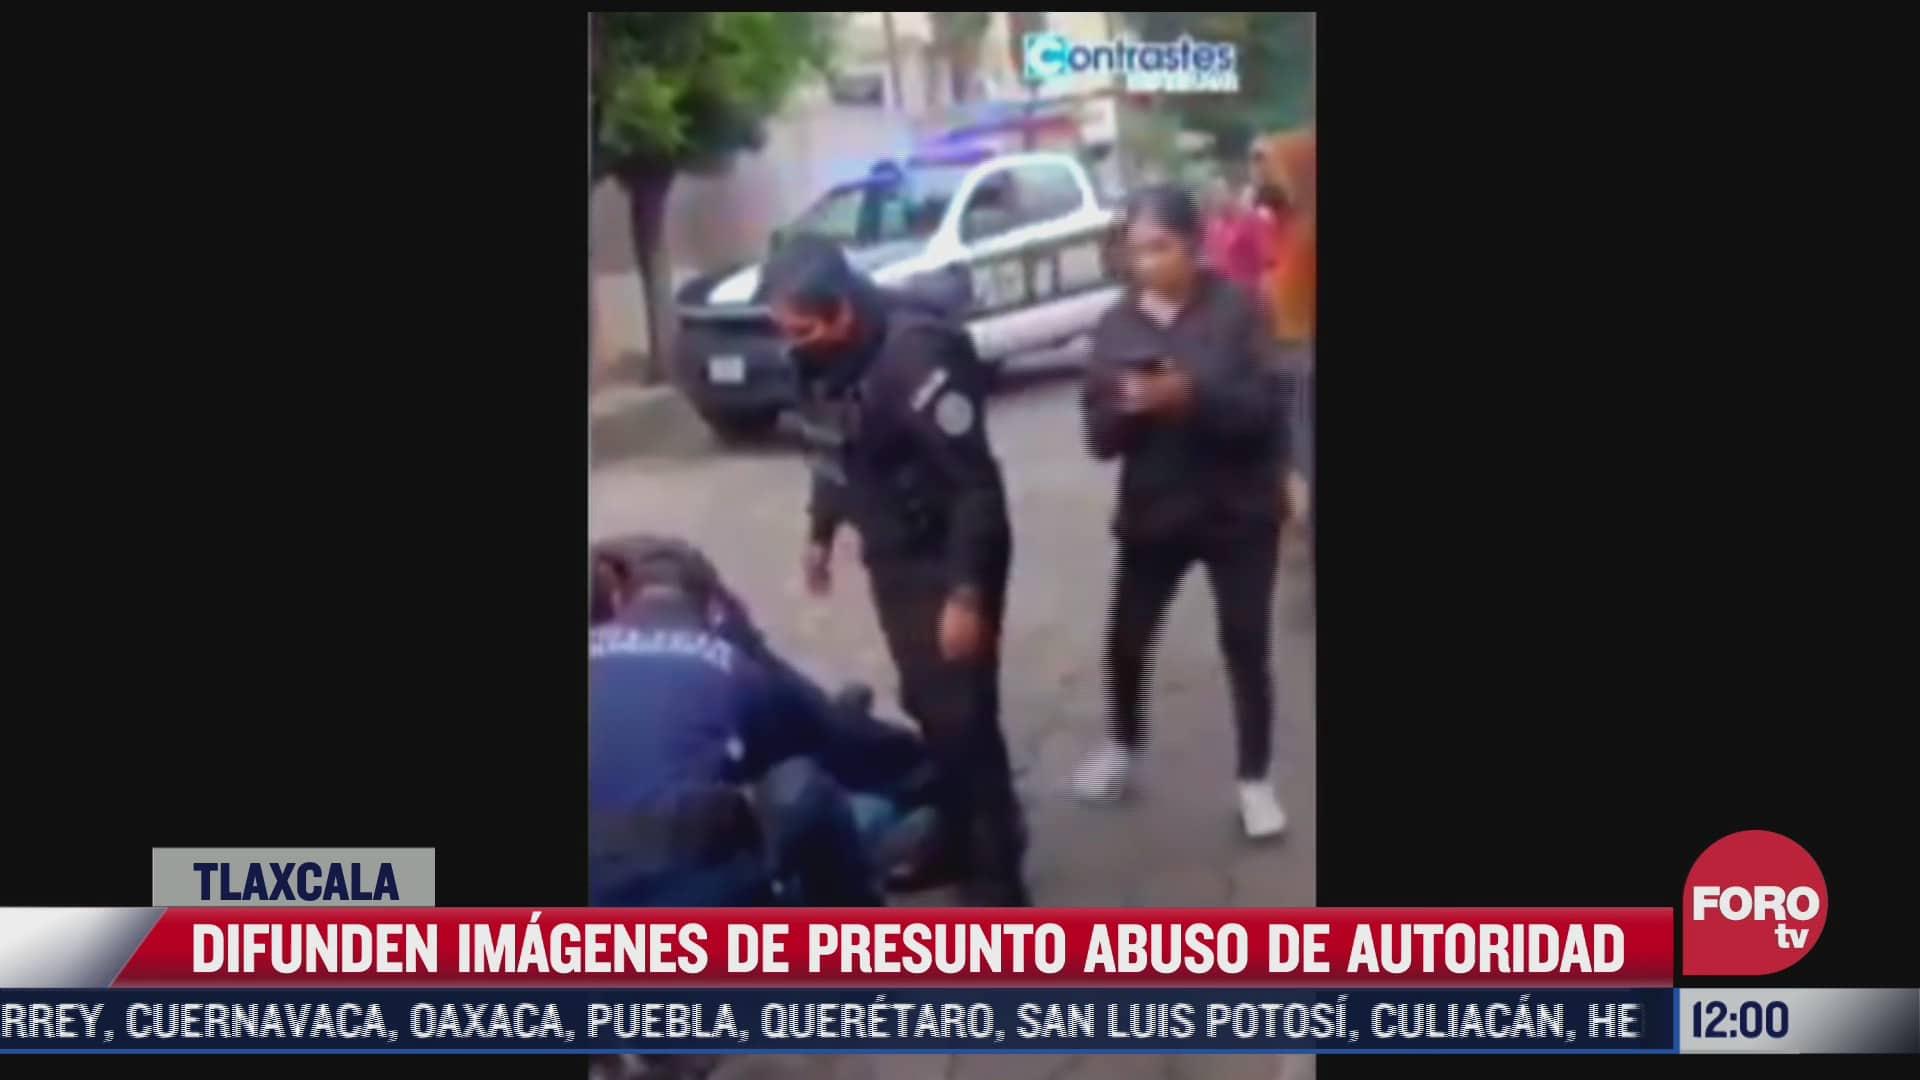 video denuncian abuso de autoridad por parte de policias de tlaxcala